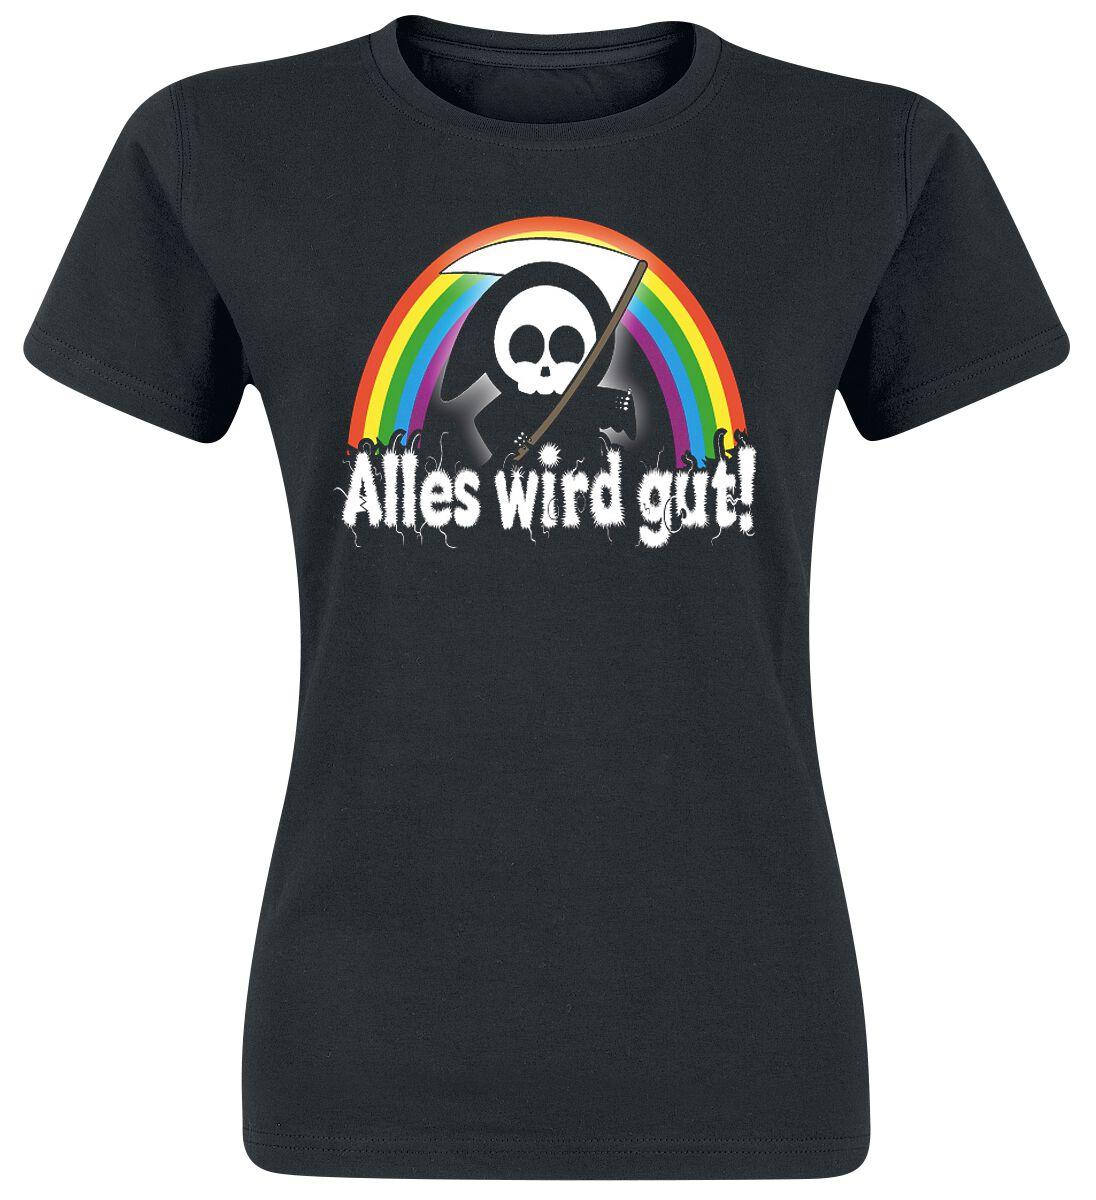 Image of Alles wird gut! Girl-Shirt schwarz